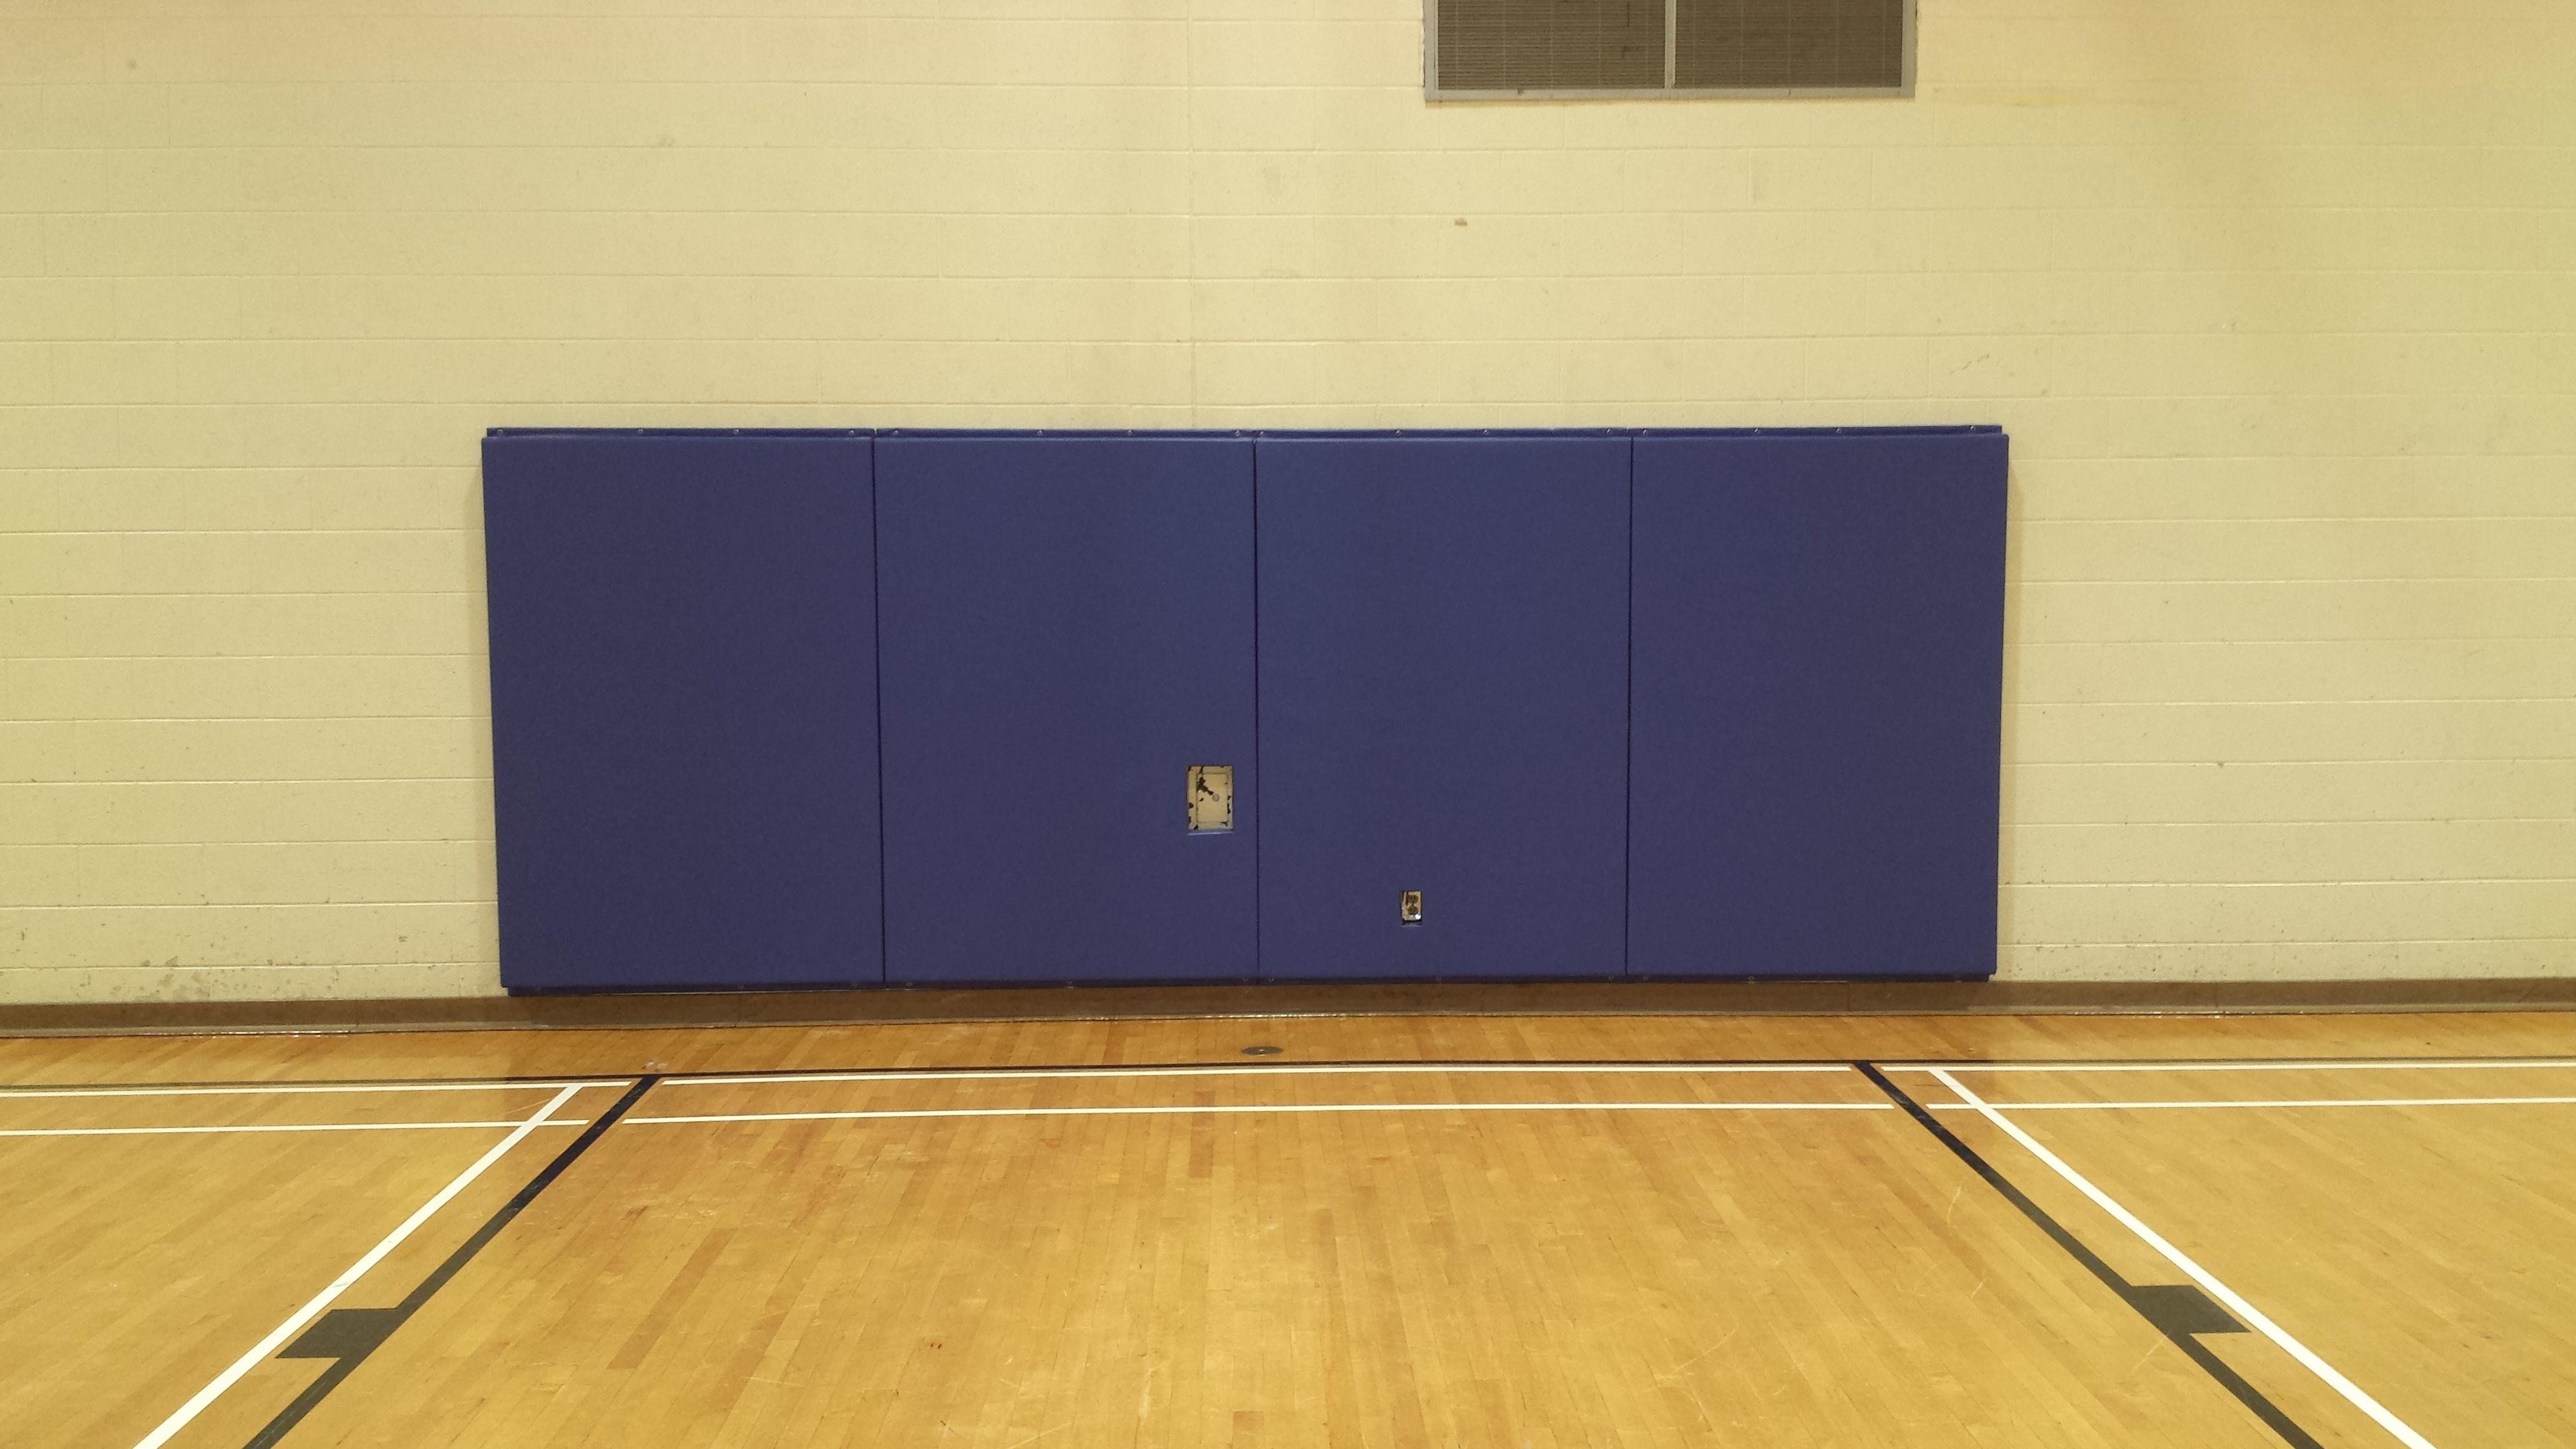 Maple-community-centre-wall-padding